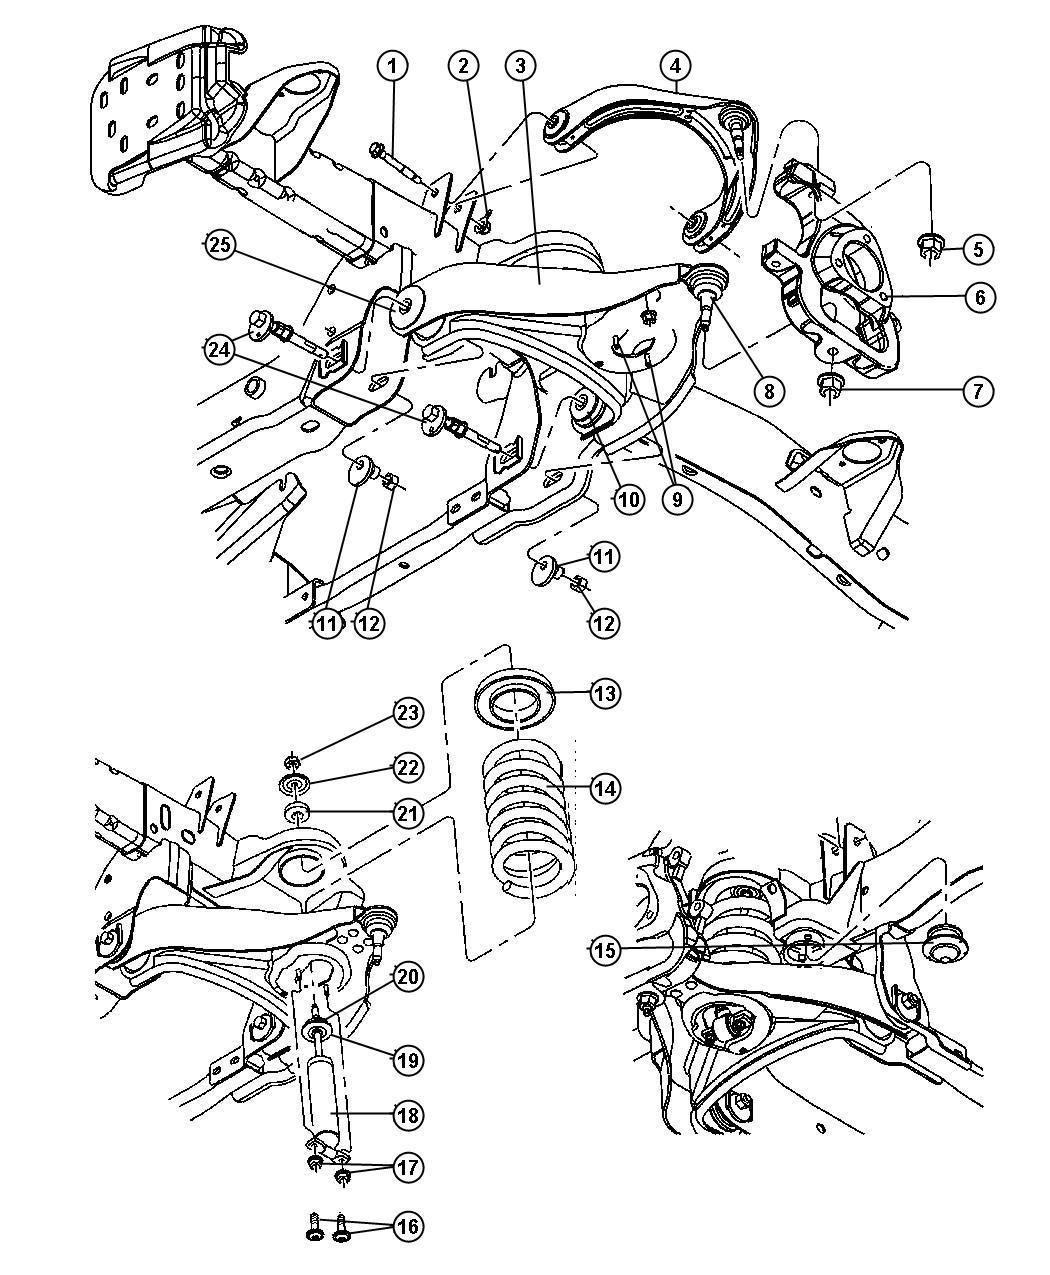 2006 Dodge Ram 1500 Bushing. Control arm. Rear. Suspension